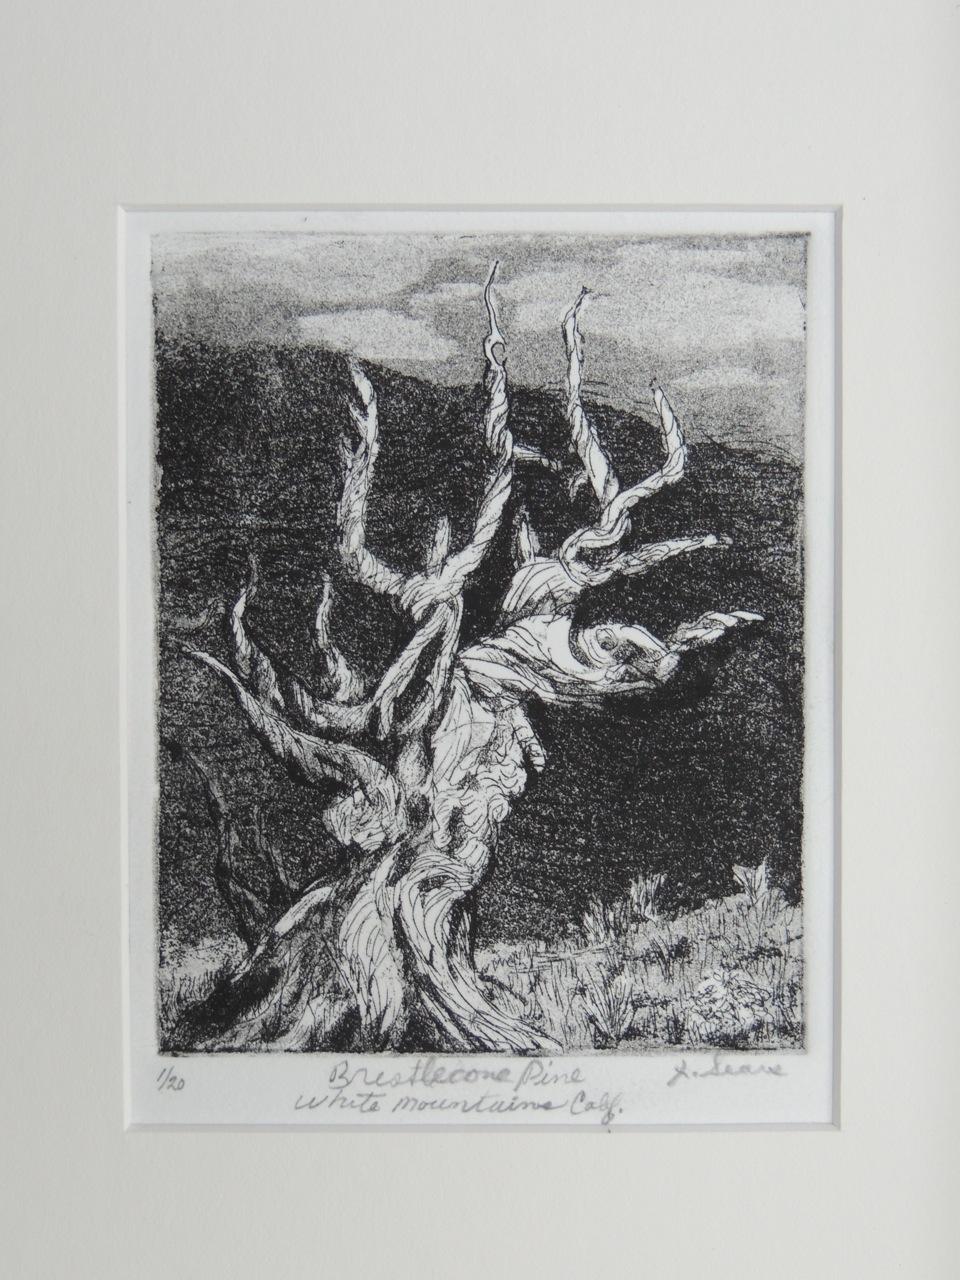 Bristlecone Pine White Mountains California (3000-4000 yrs old)